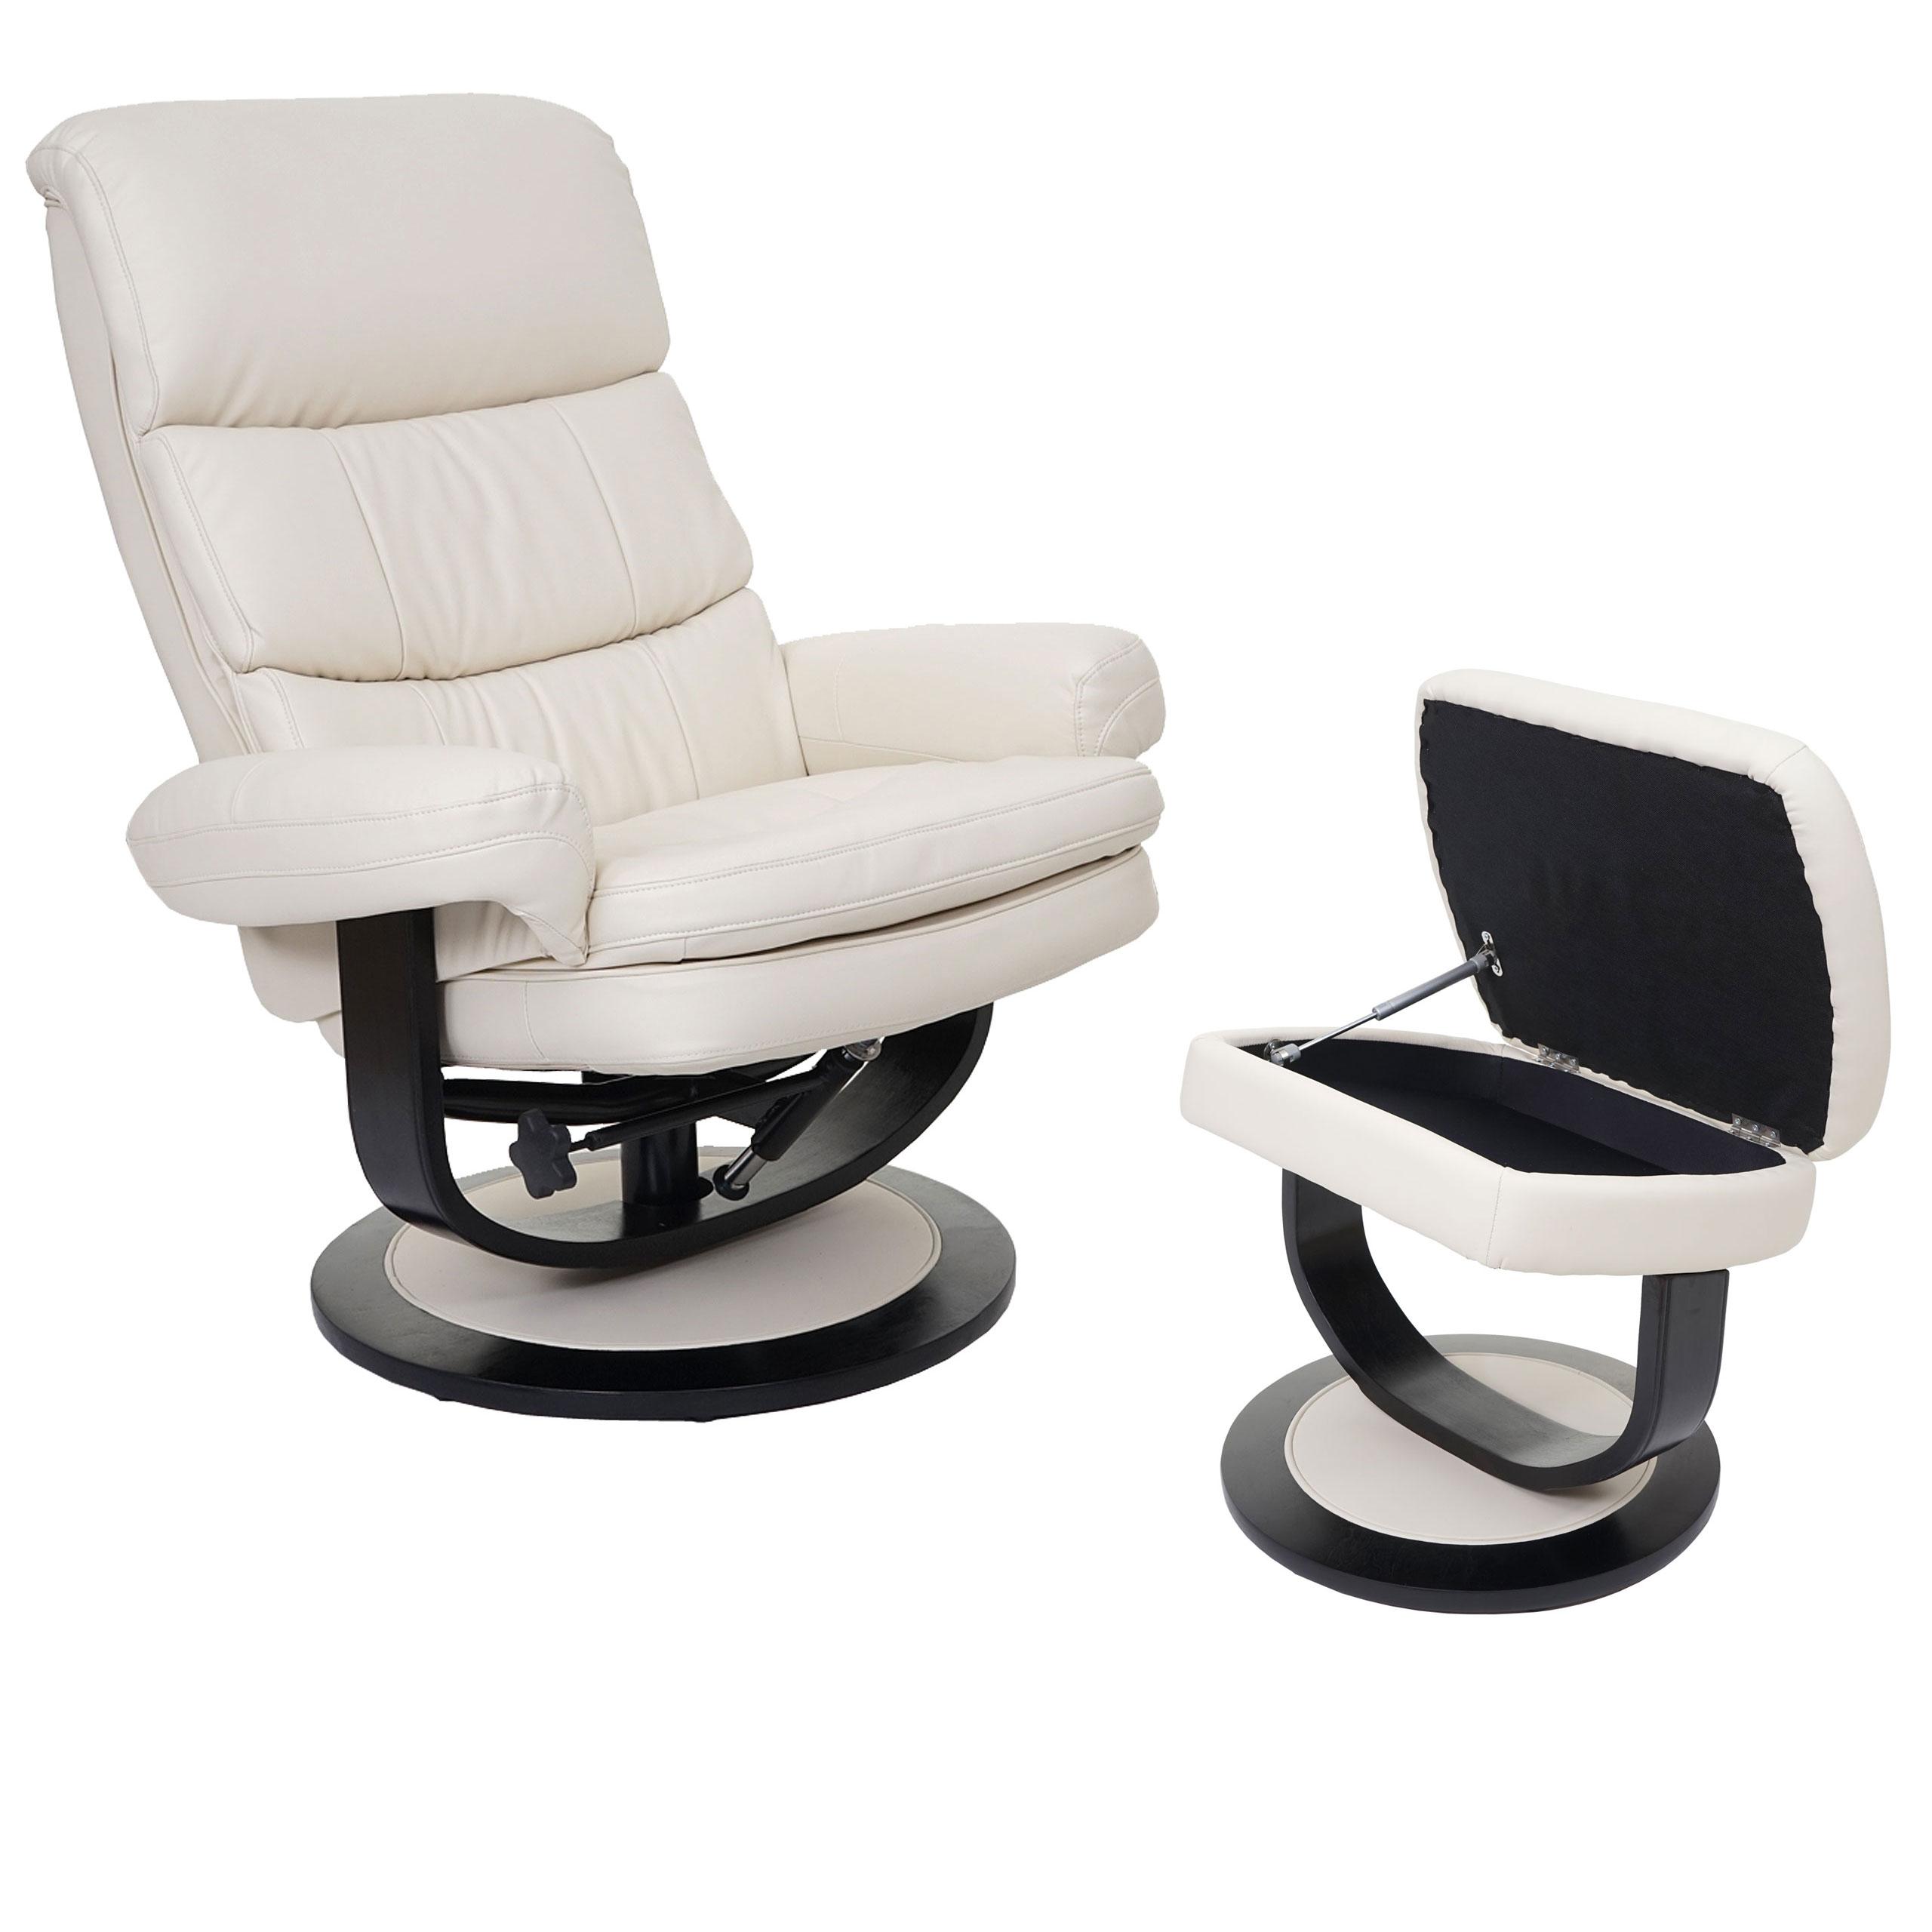 Relaxsessel hwc c16 fernsehsessel tv sessel hocker mit for Ohrensessel verstellbar mit hocker